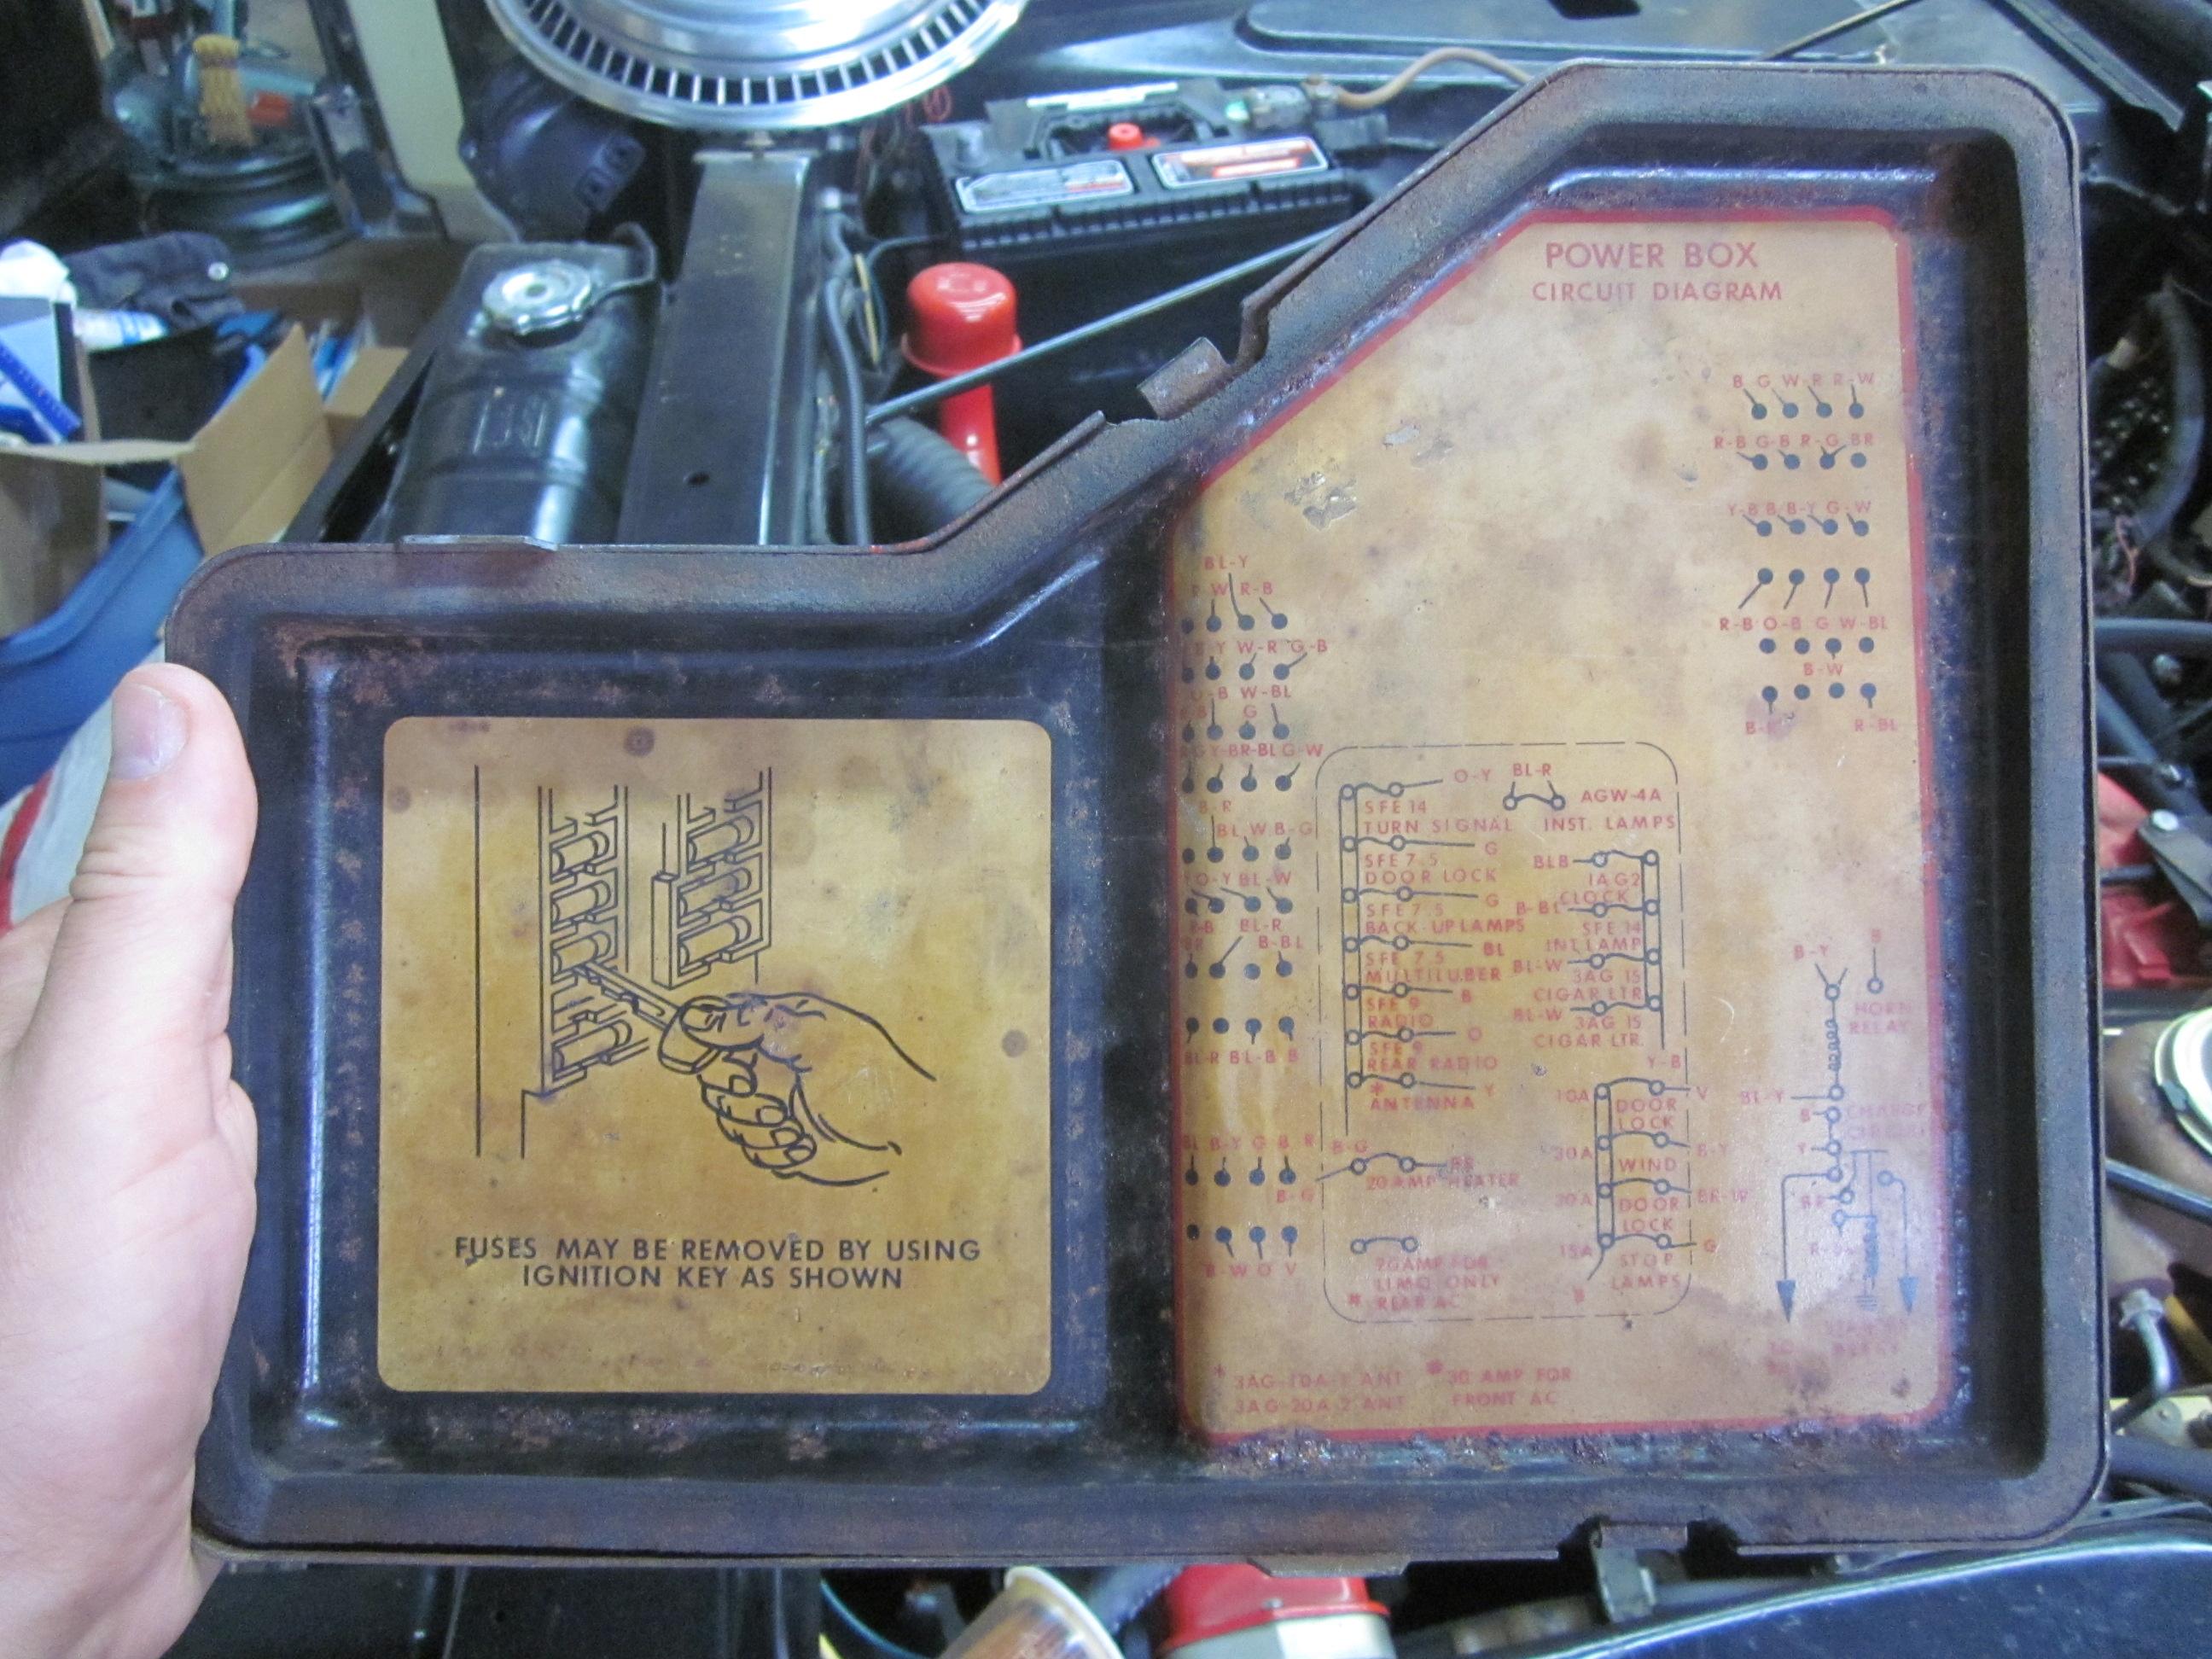 1968 corvette fuse box wiring diagram1969 corvette fuse box location wiring diagram database1969 corvette fuse box [ 2592 x 1944 Pixel ]